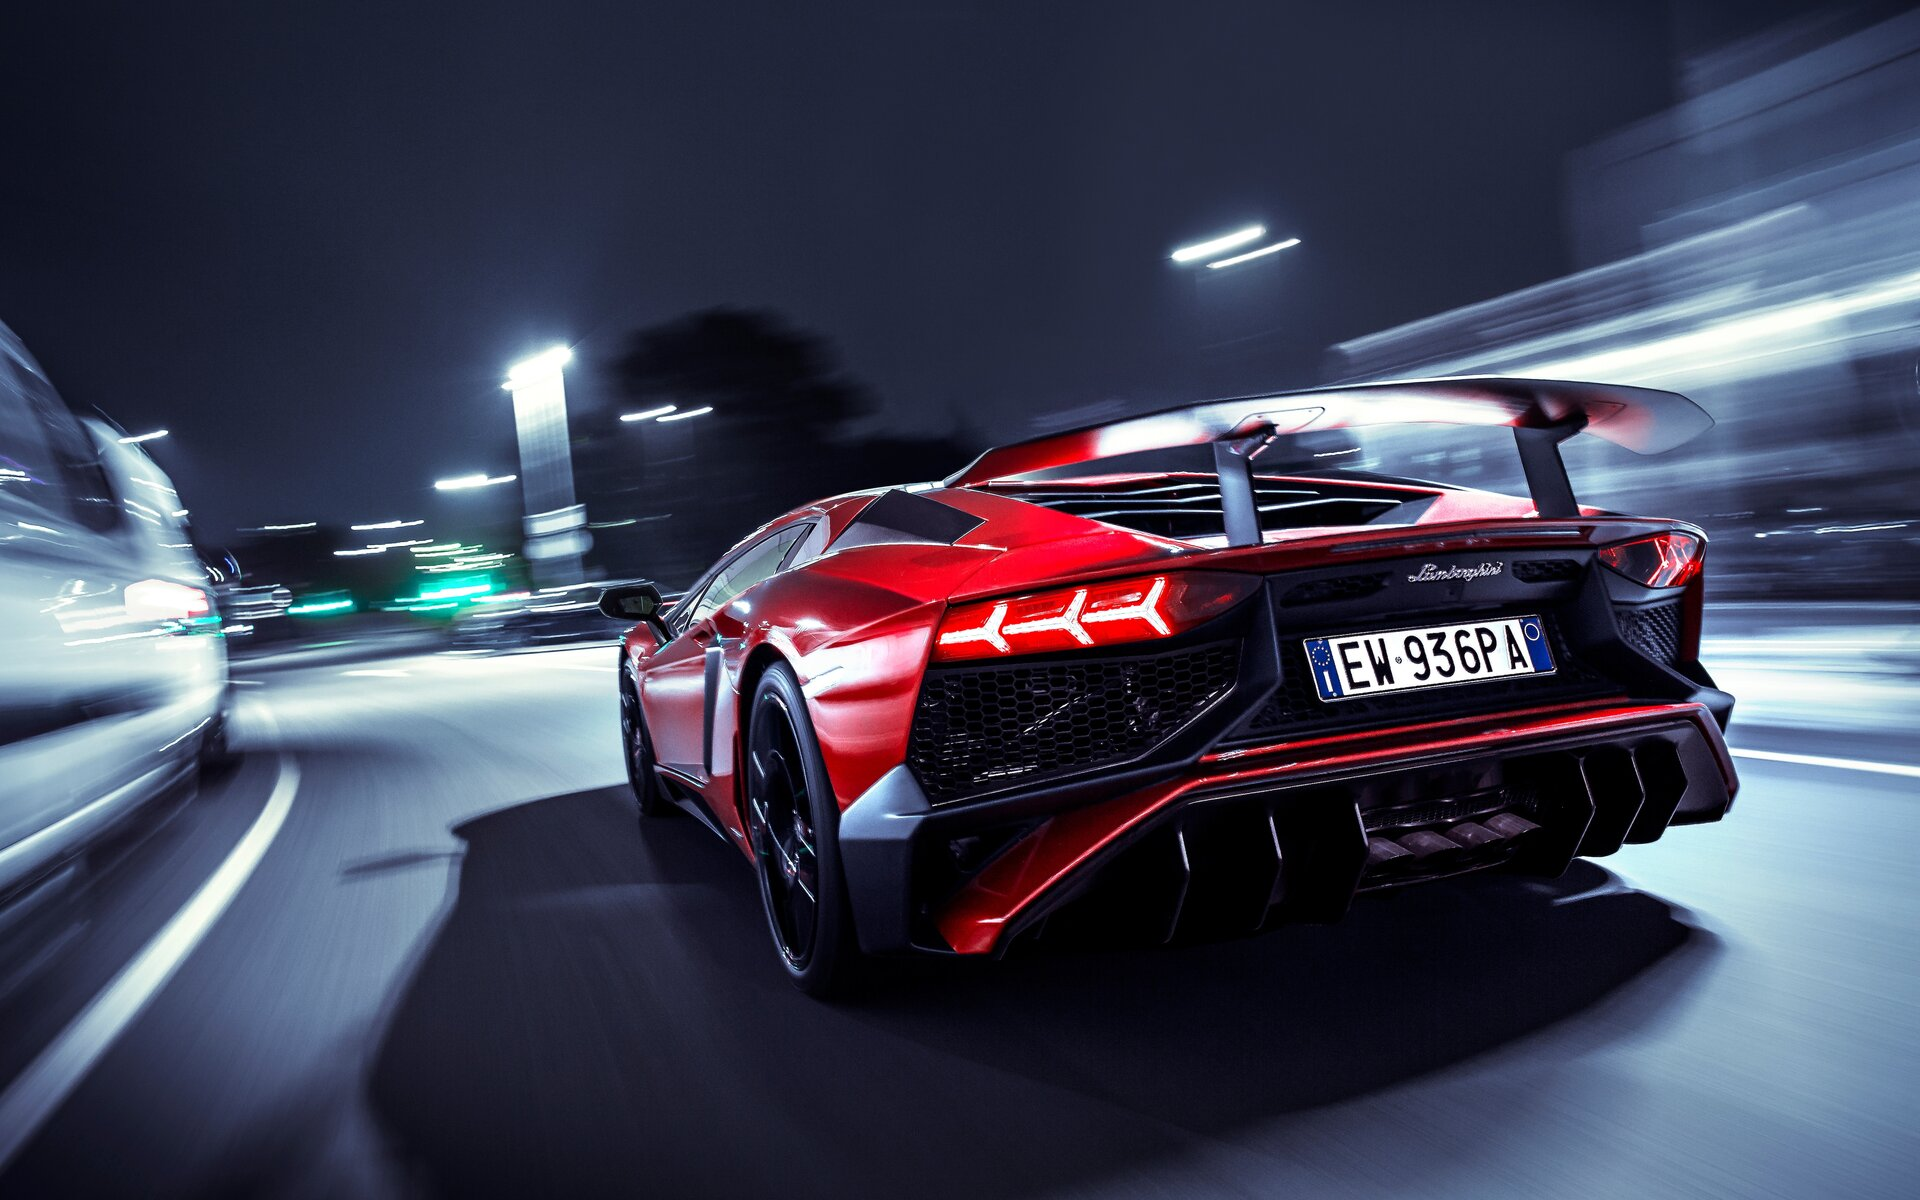 lamborghini-aventador-sv-rear-lights-fz.jpg